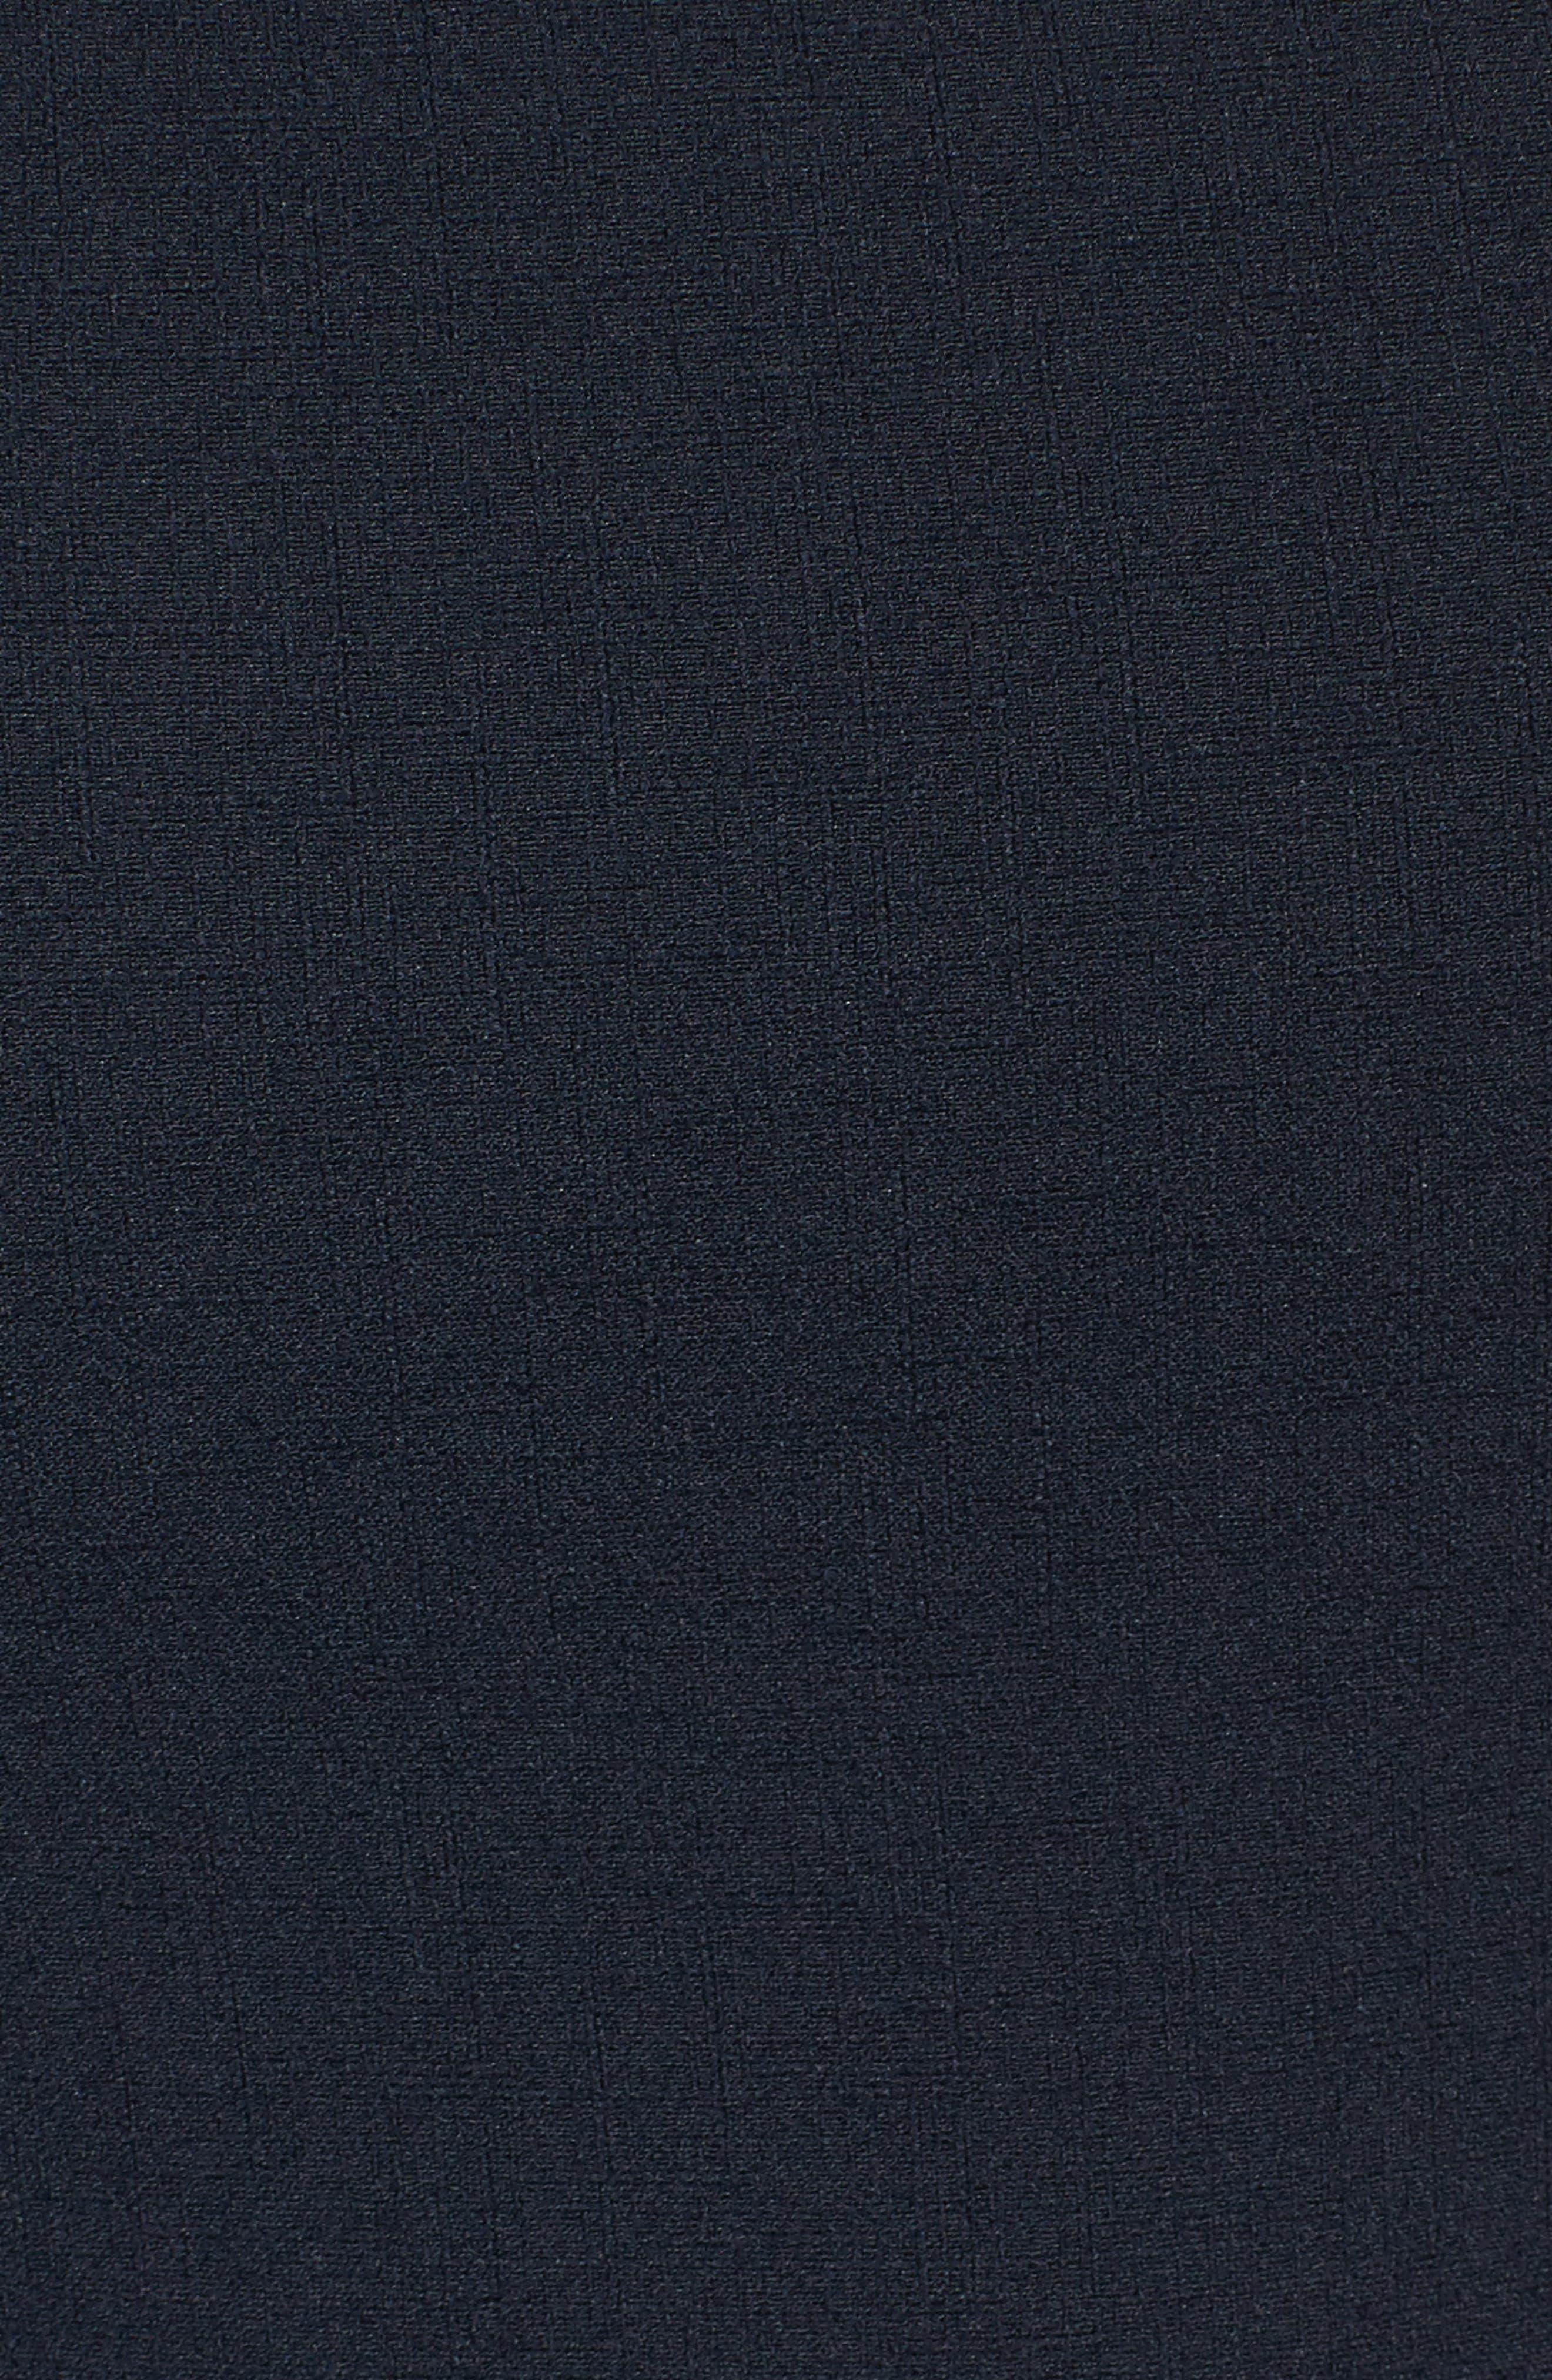 Strapless Jumpsuit,                             Alternate thumbnail 7, color,                             Navy Sapphire